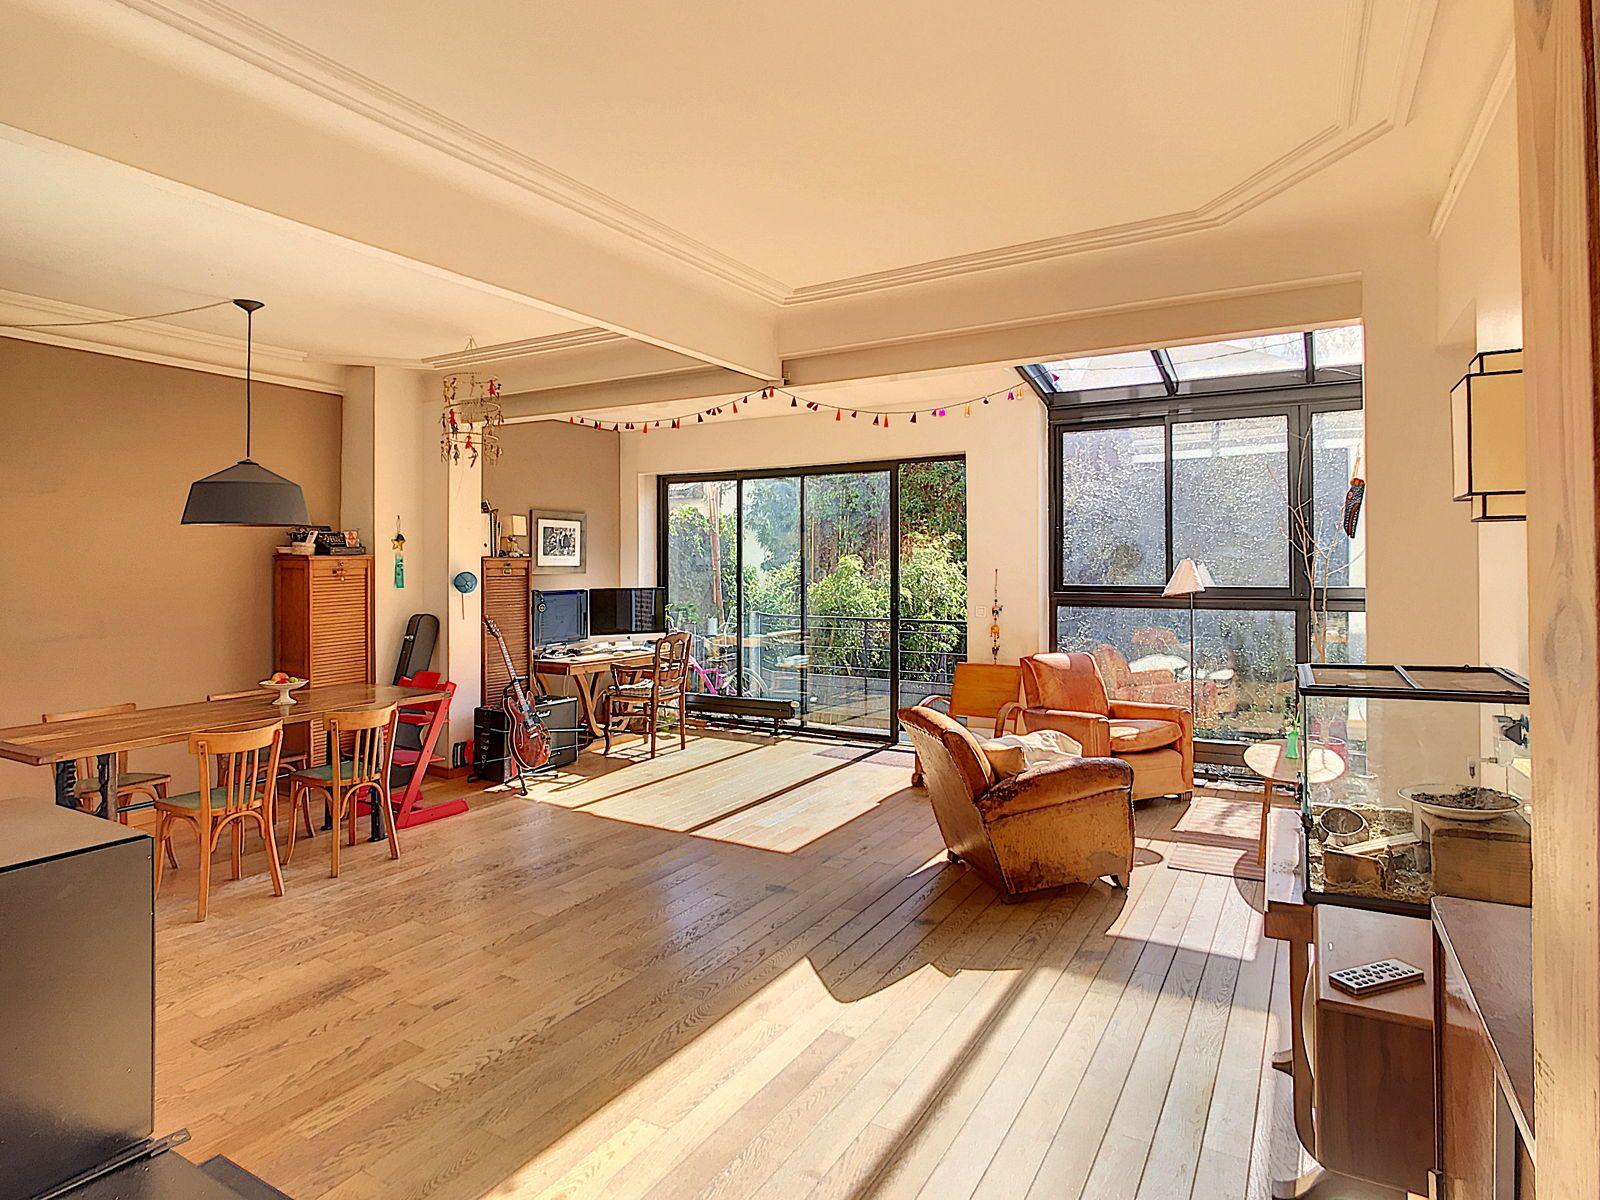 Vends maison 158m²/4chambres/terasses/jardin/transports Malakoff